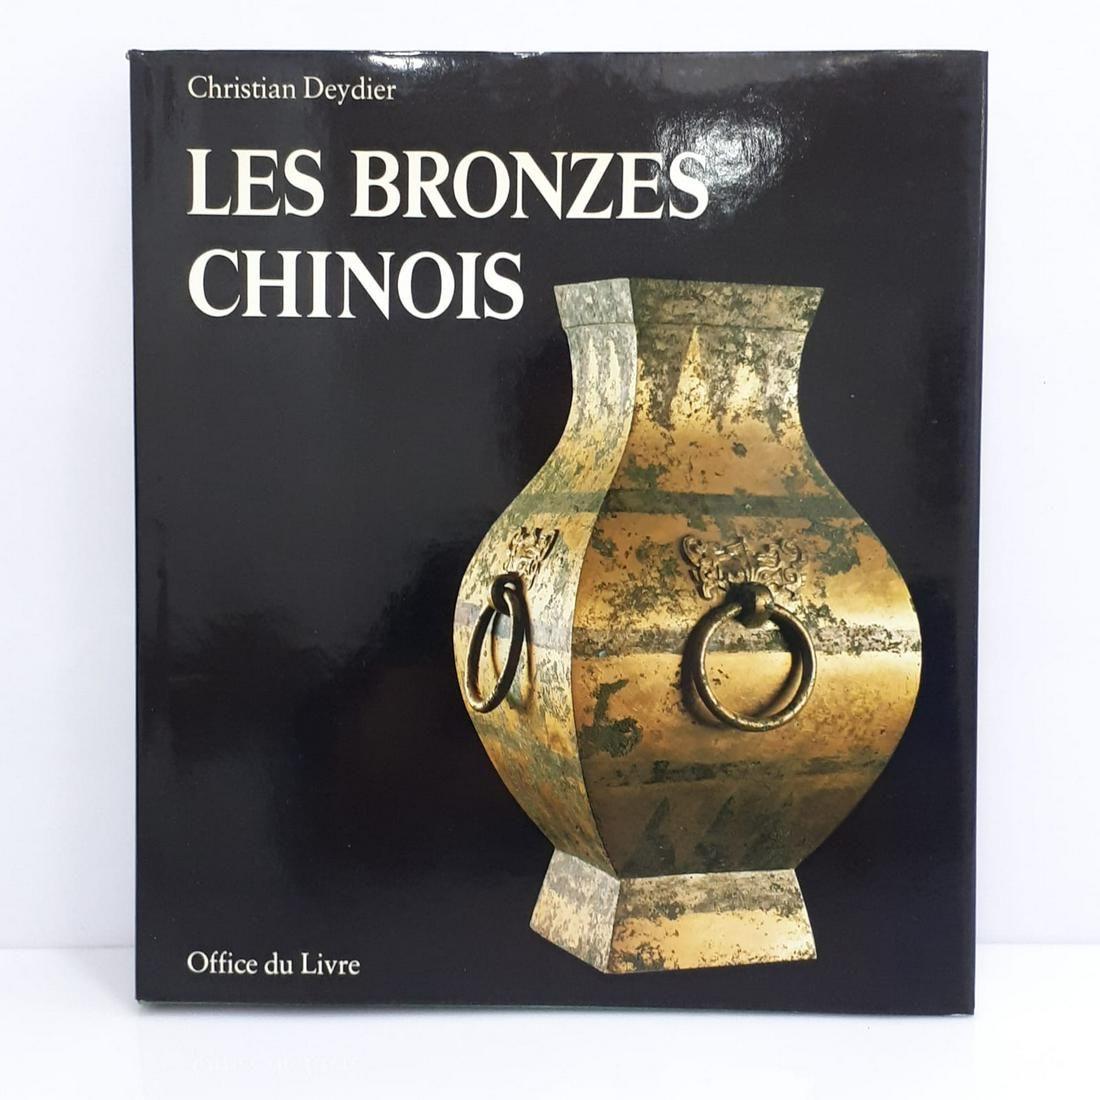 LES BRONZES CHINOIS